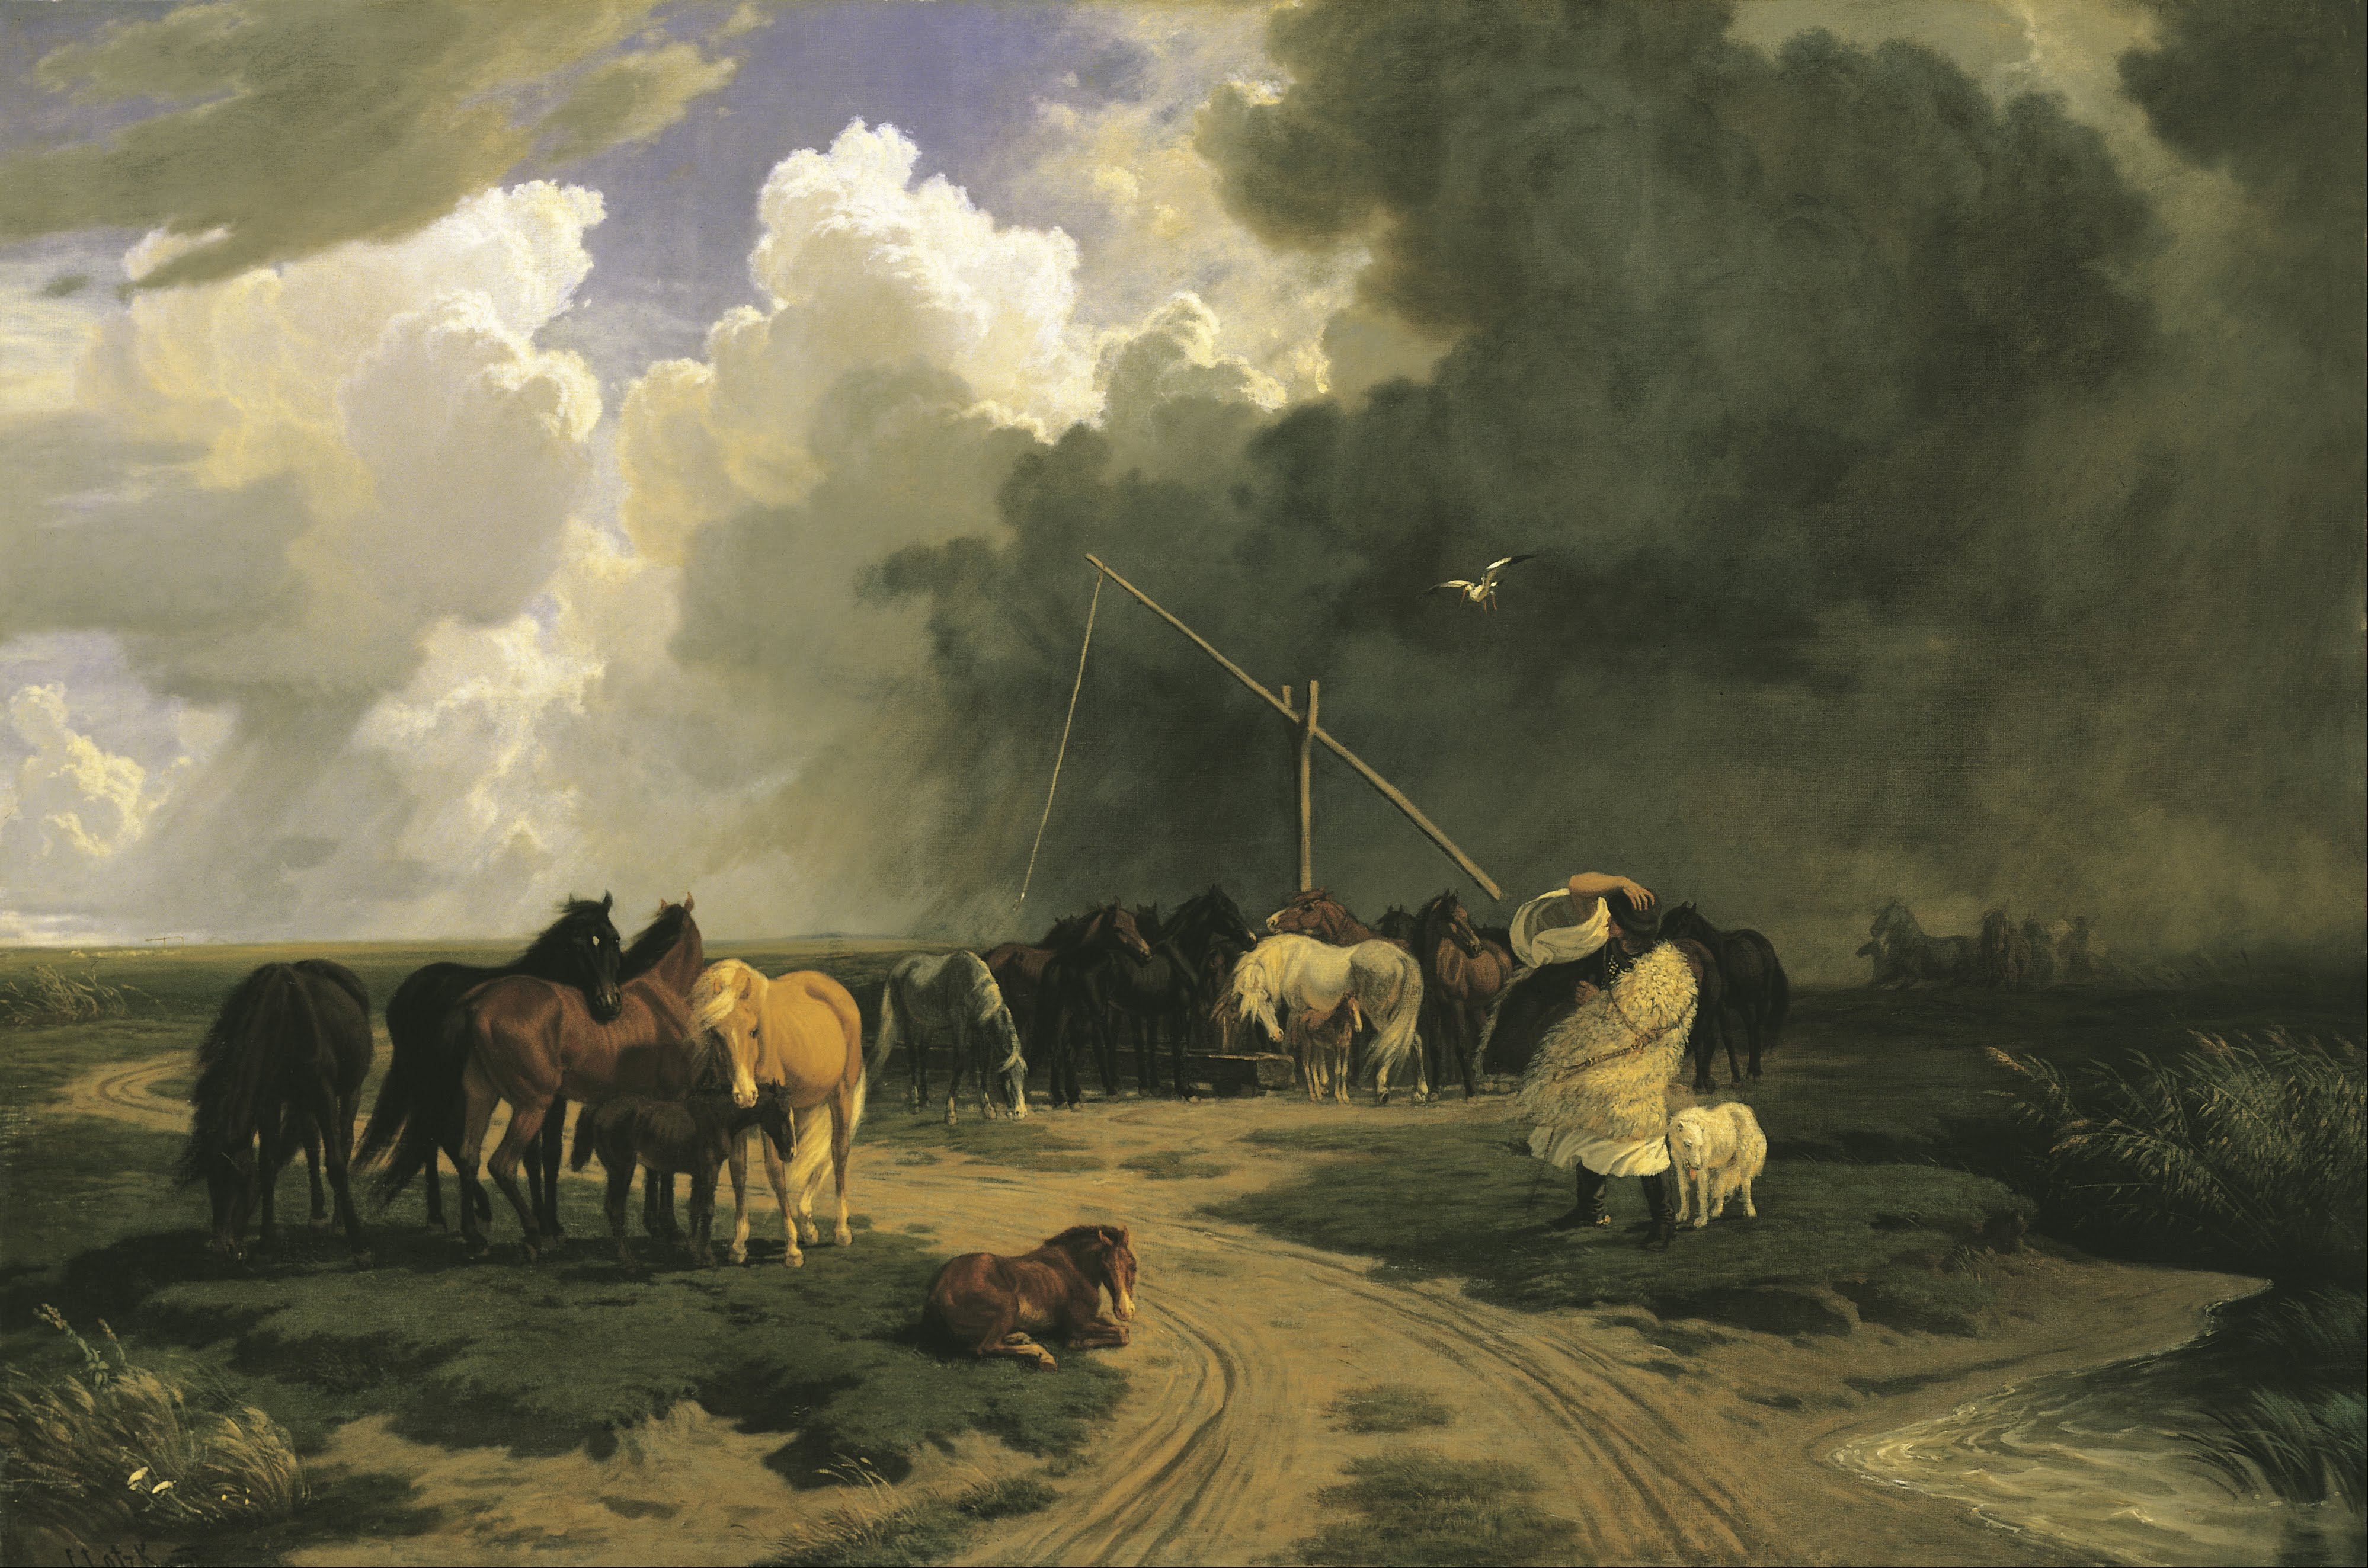 Google Images Fall Wallpaper File Lotz K 225 Roly Horses In A Rainstorm Google Art